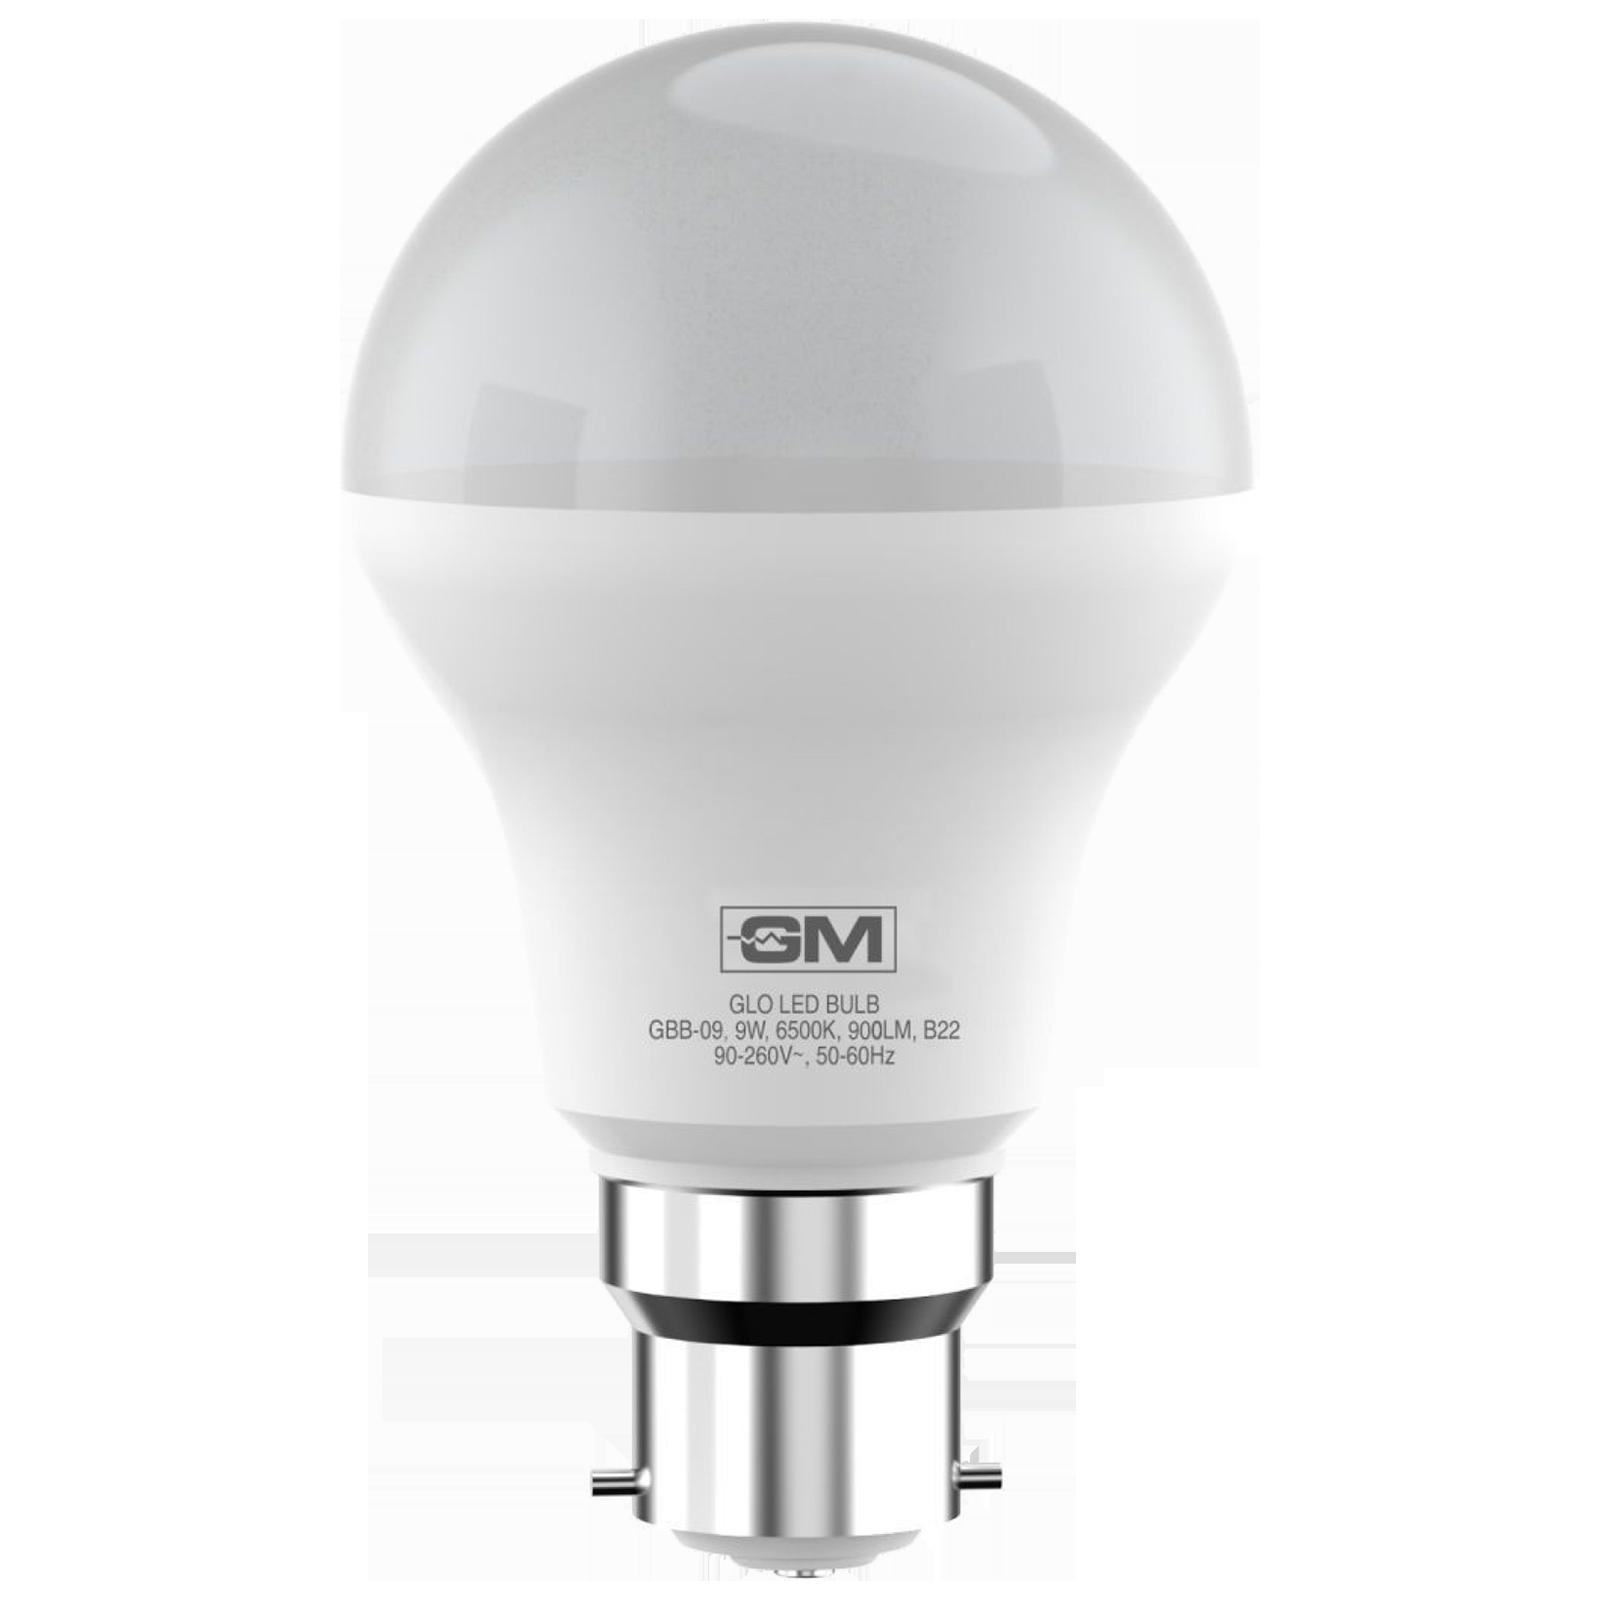 GM GLO 9 Watts Electric Powered LED Bulb (900 Lumens, GBB-09-6.5K-6500K, White)_1